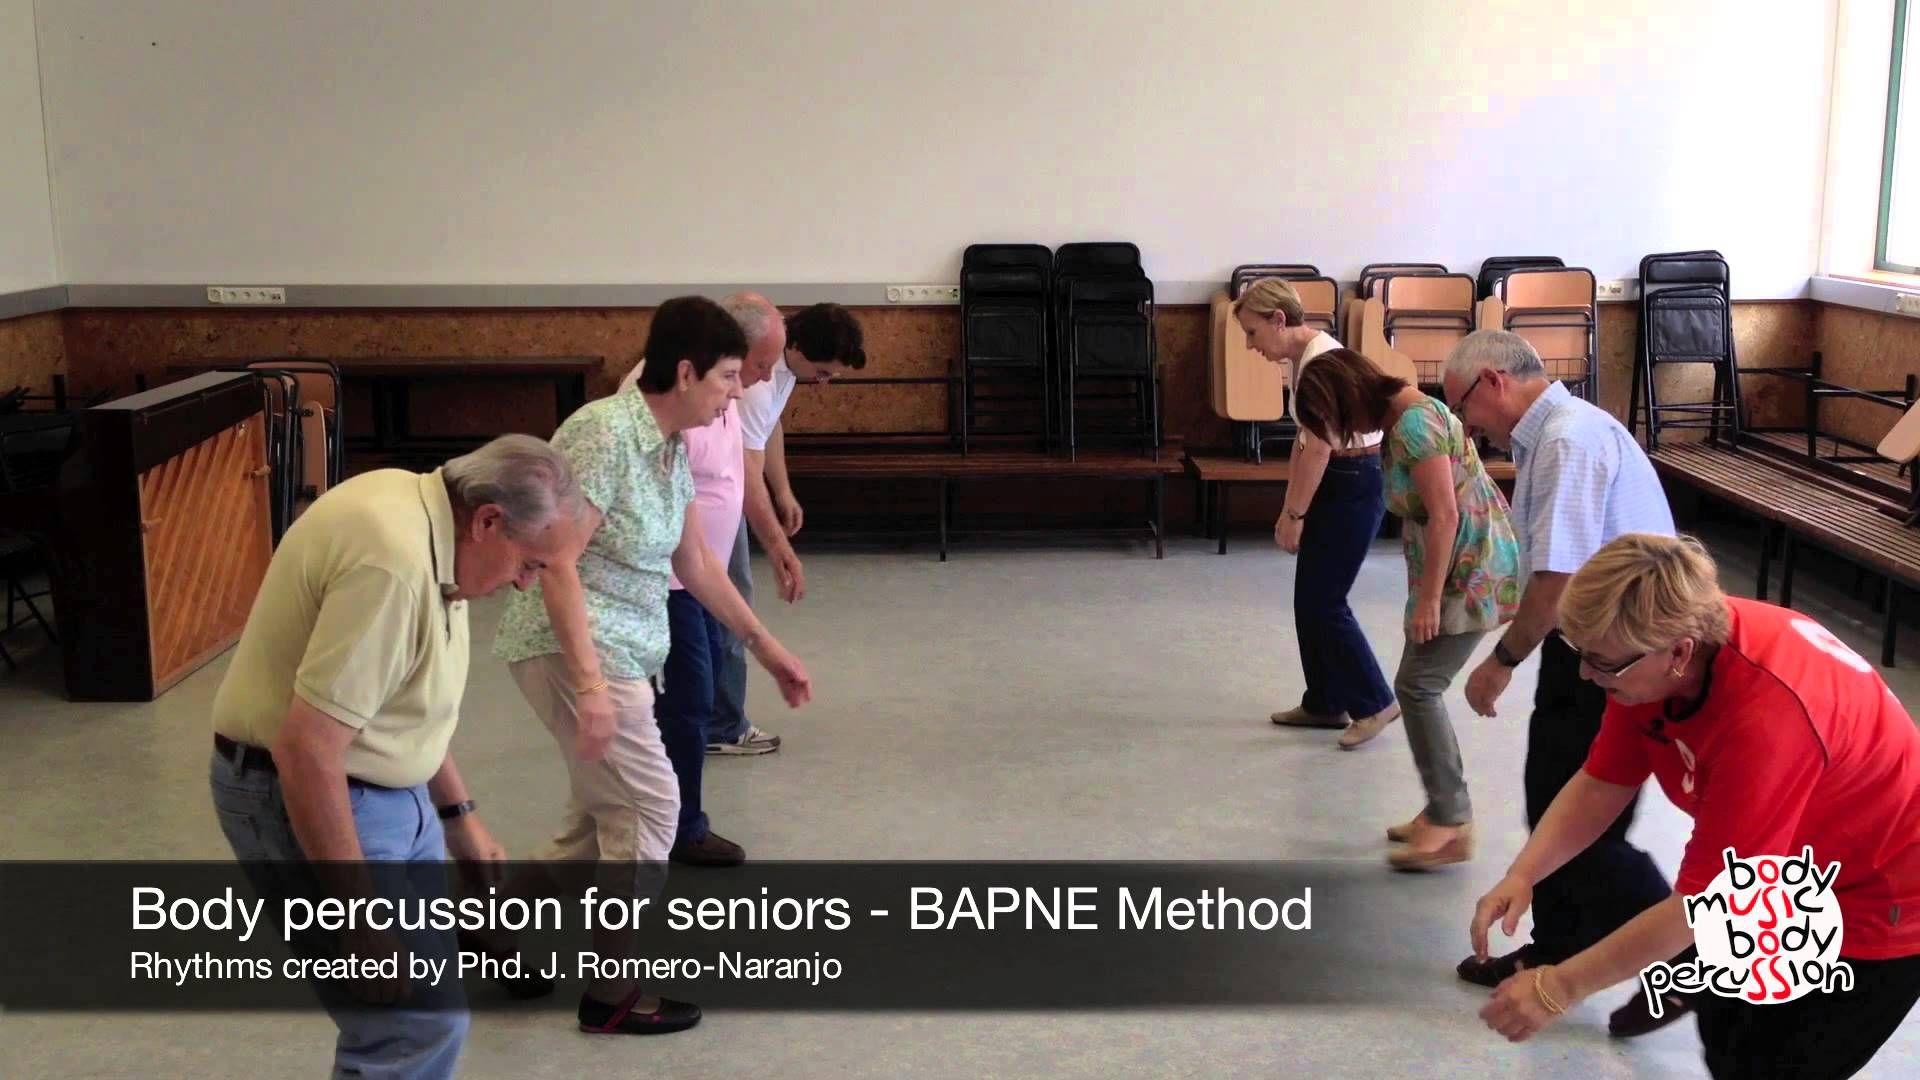 Body percussion for elderly people BAPNE Method 2